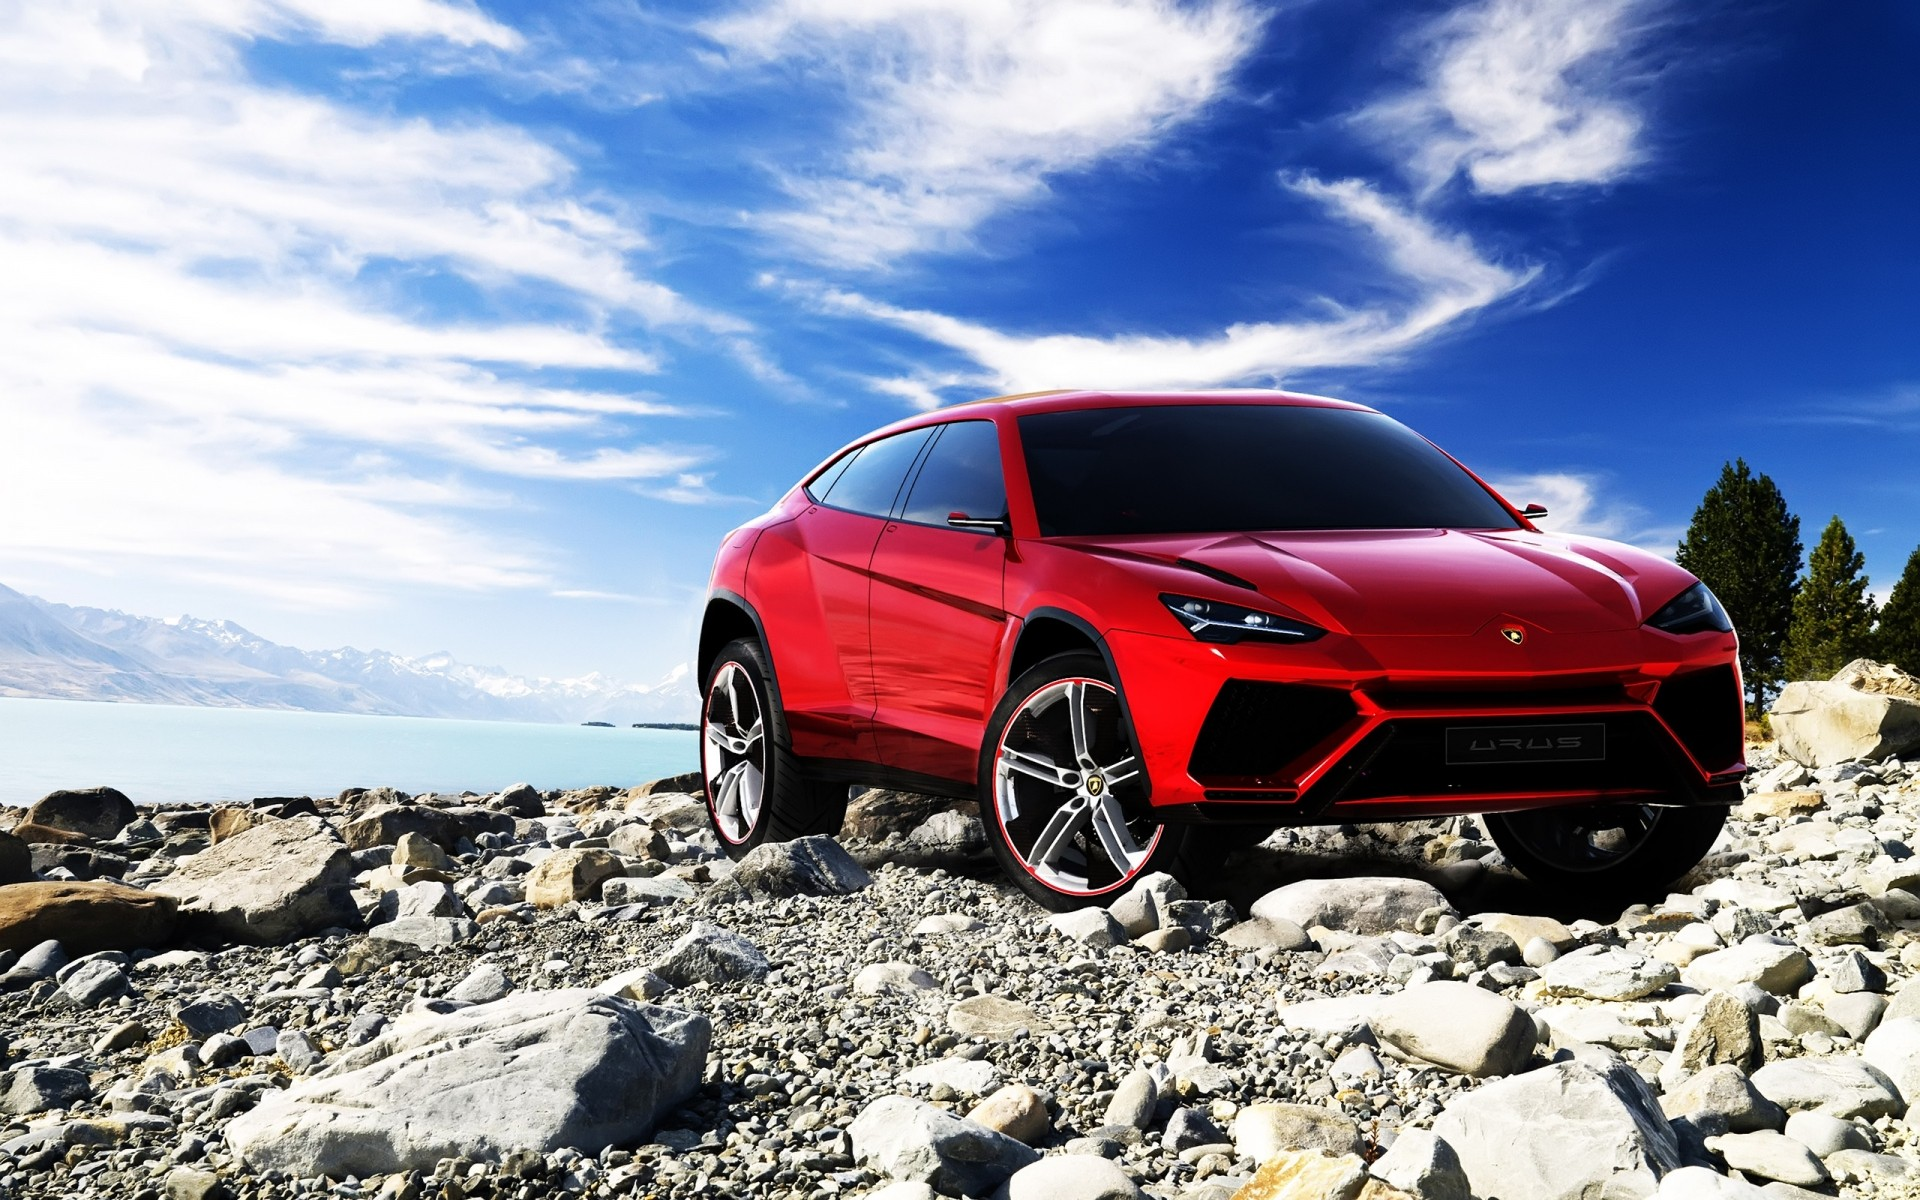 Lamborghini Urus Concept Iphone Wallpapers For Free